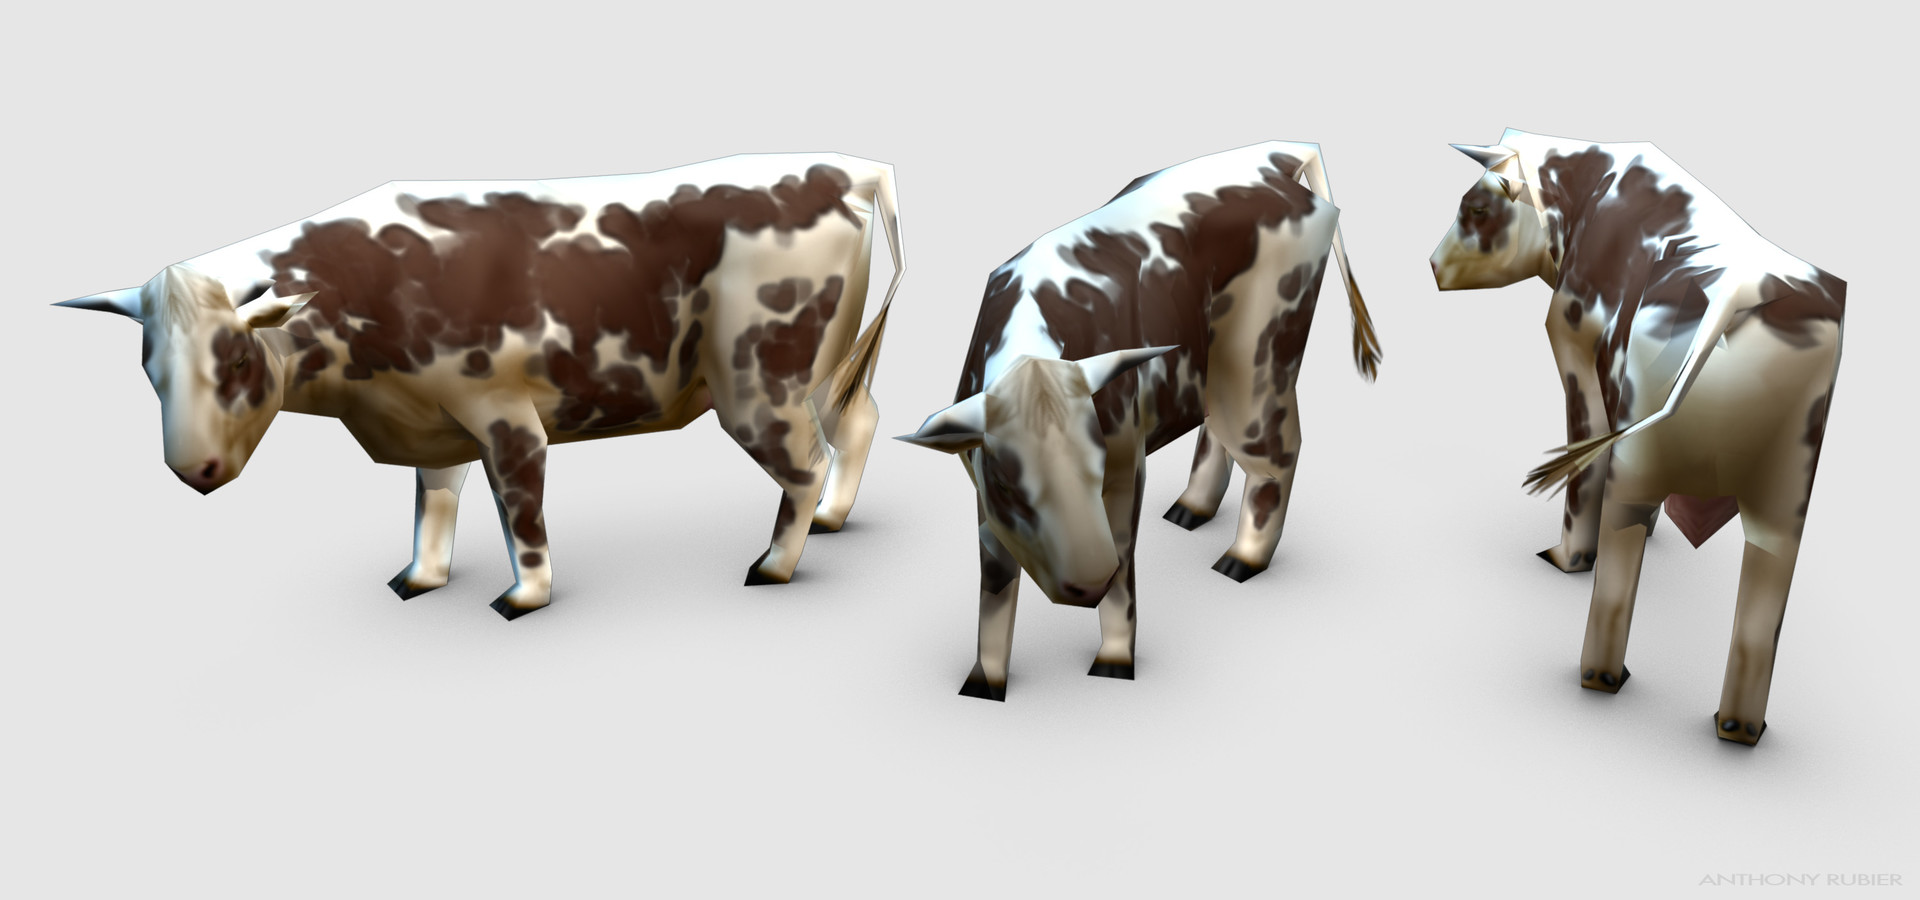 Anthony rubier render mesh vache 1